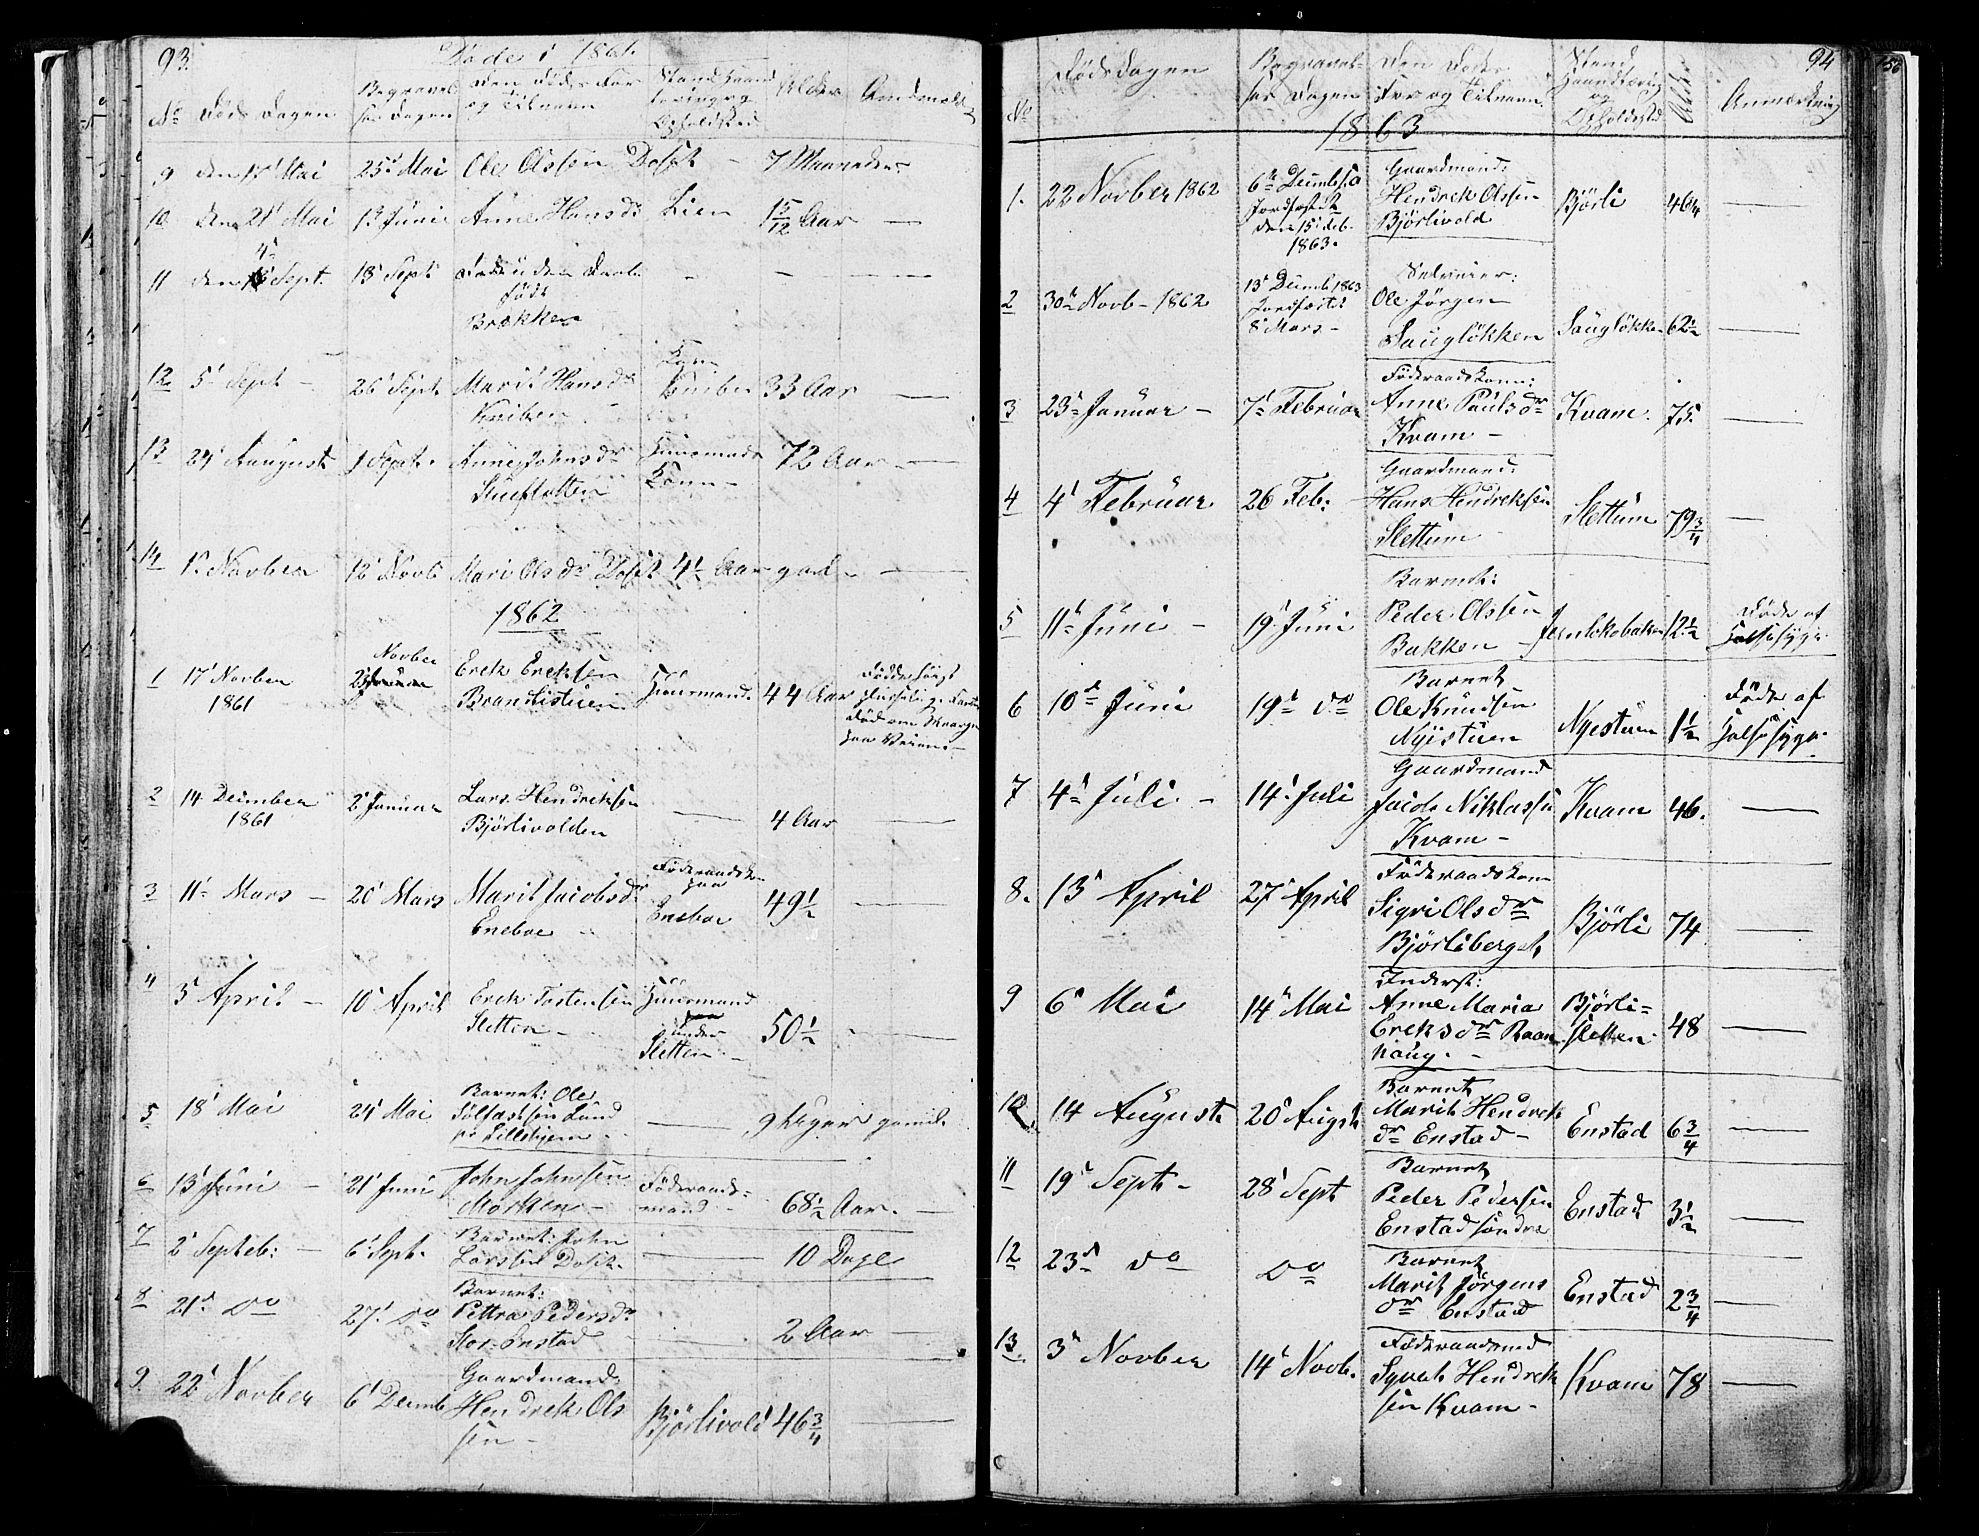 SAH, Lesja prestekontor, Klokkerbok nr. 4, 1842-1871, s. 93-94